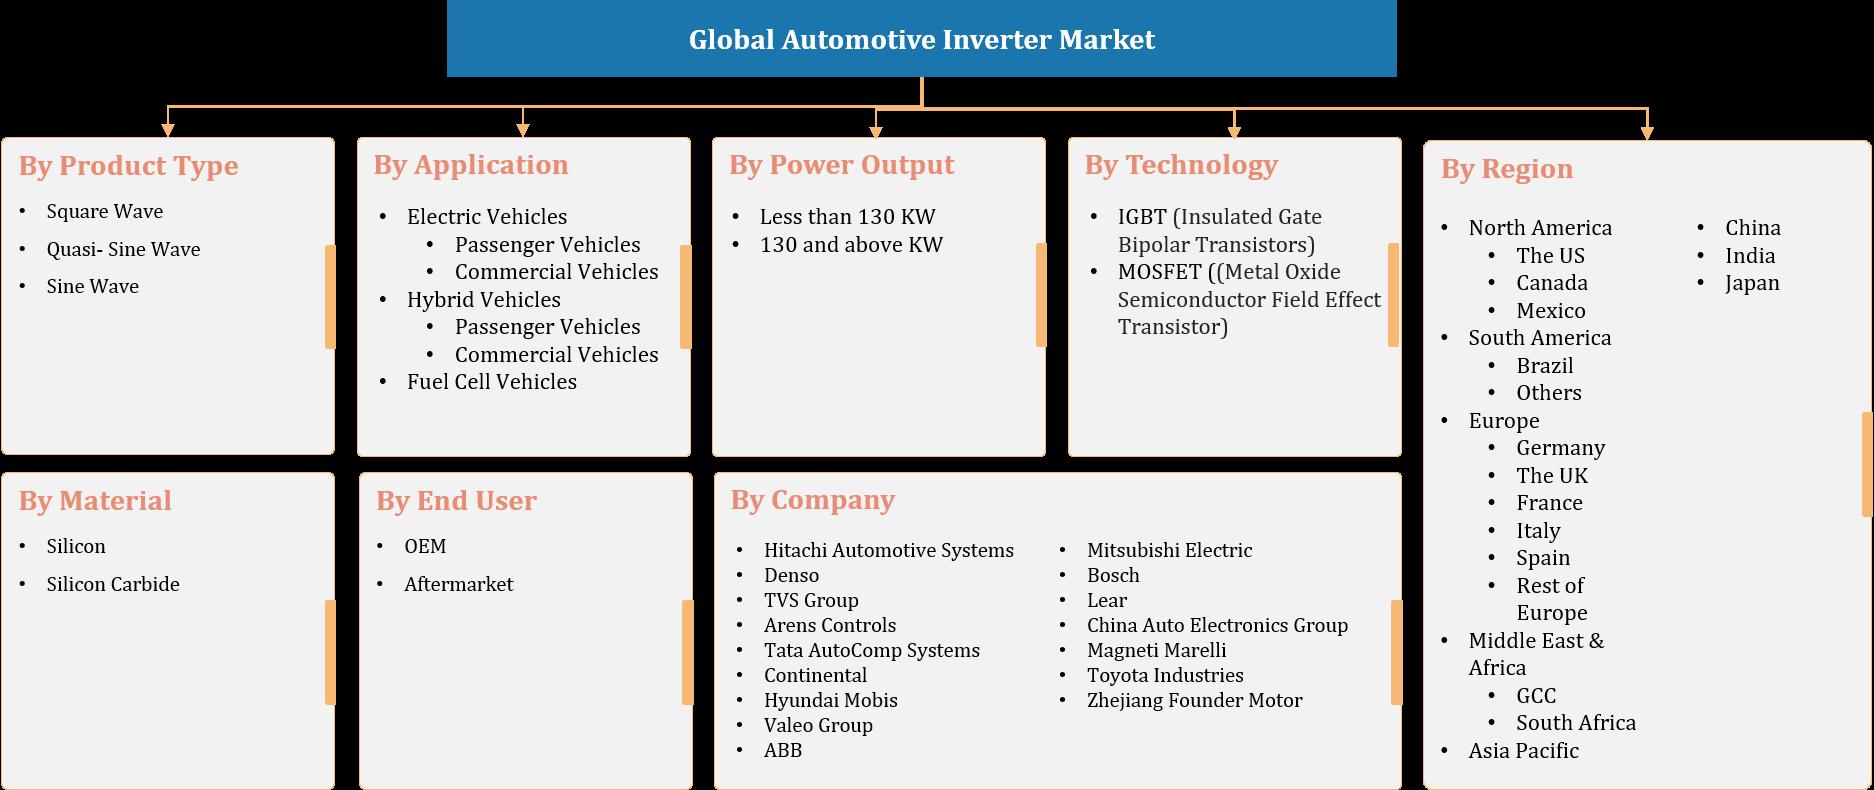 Global Automotive Inverter Market Segmentation